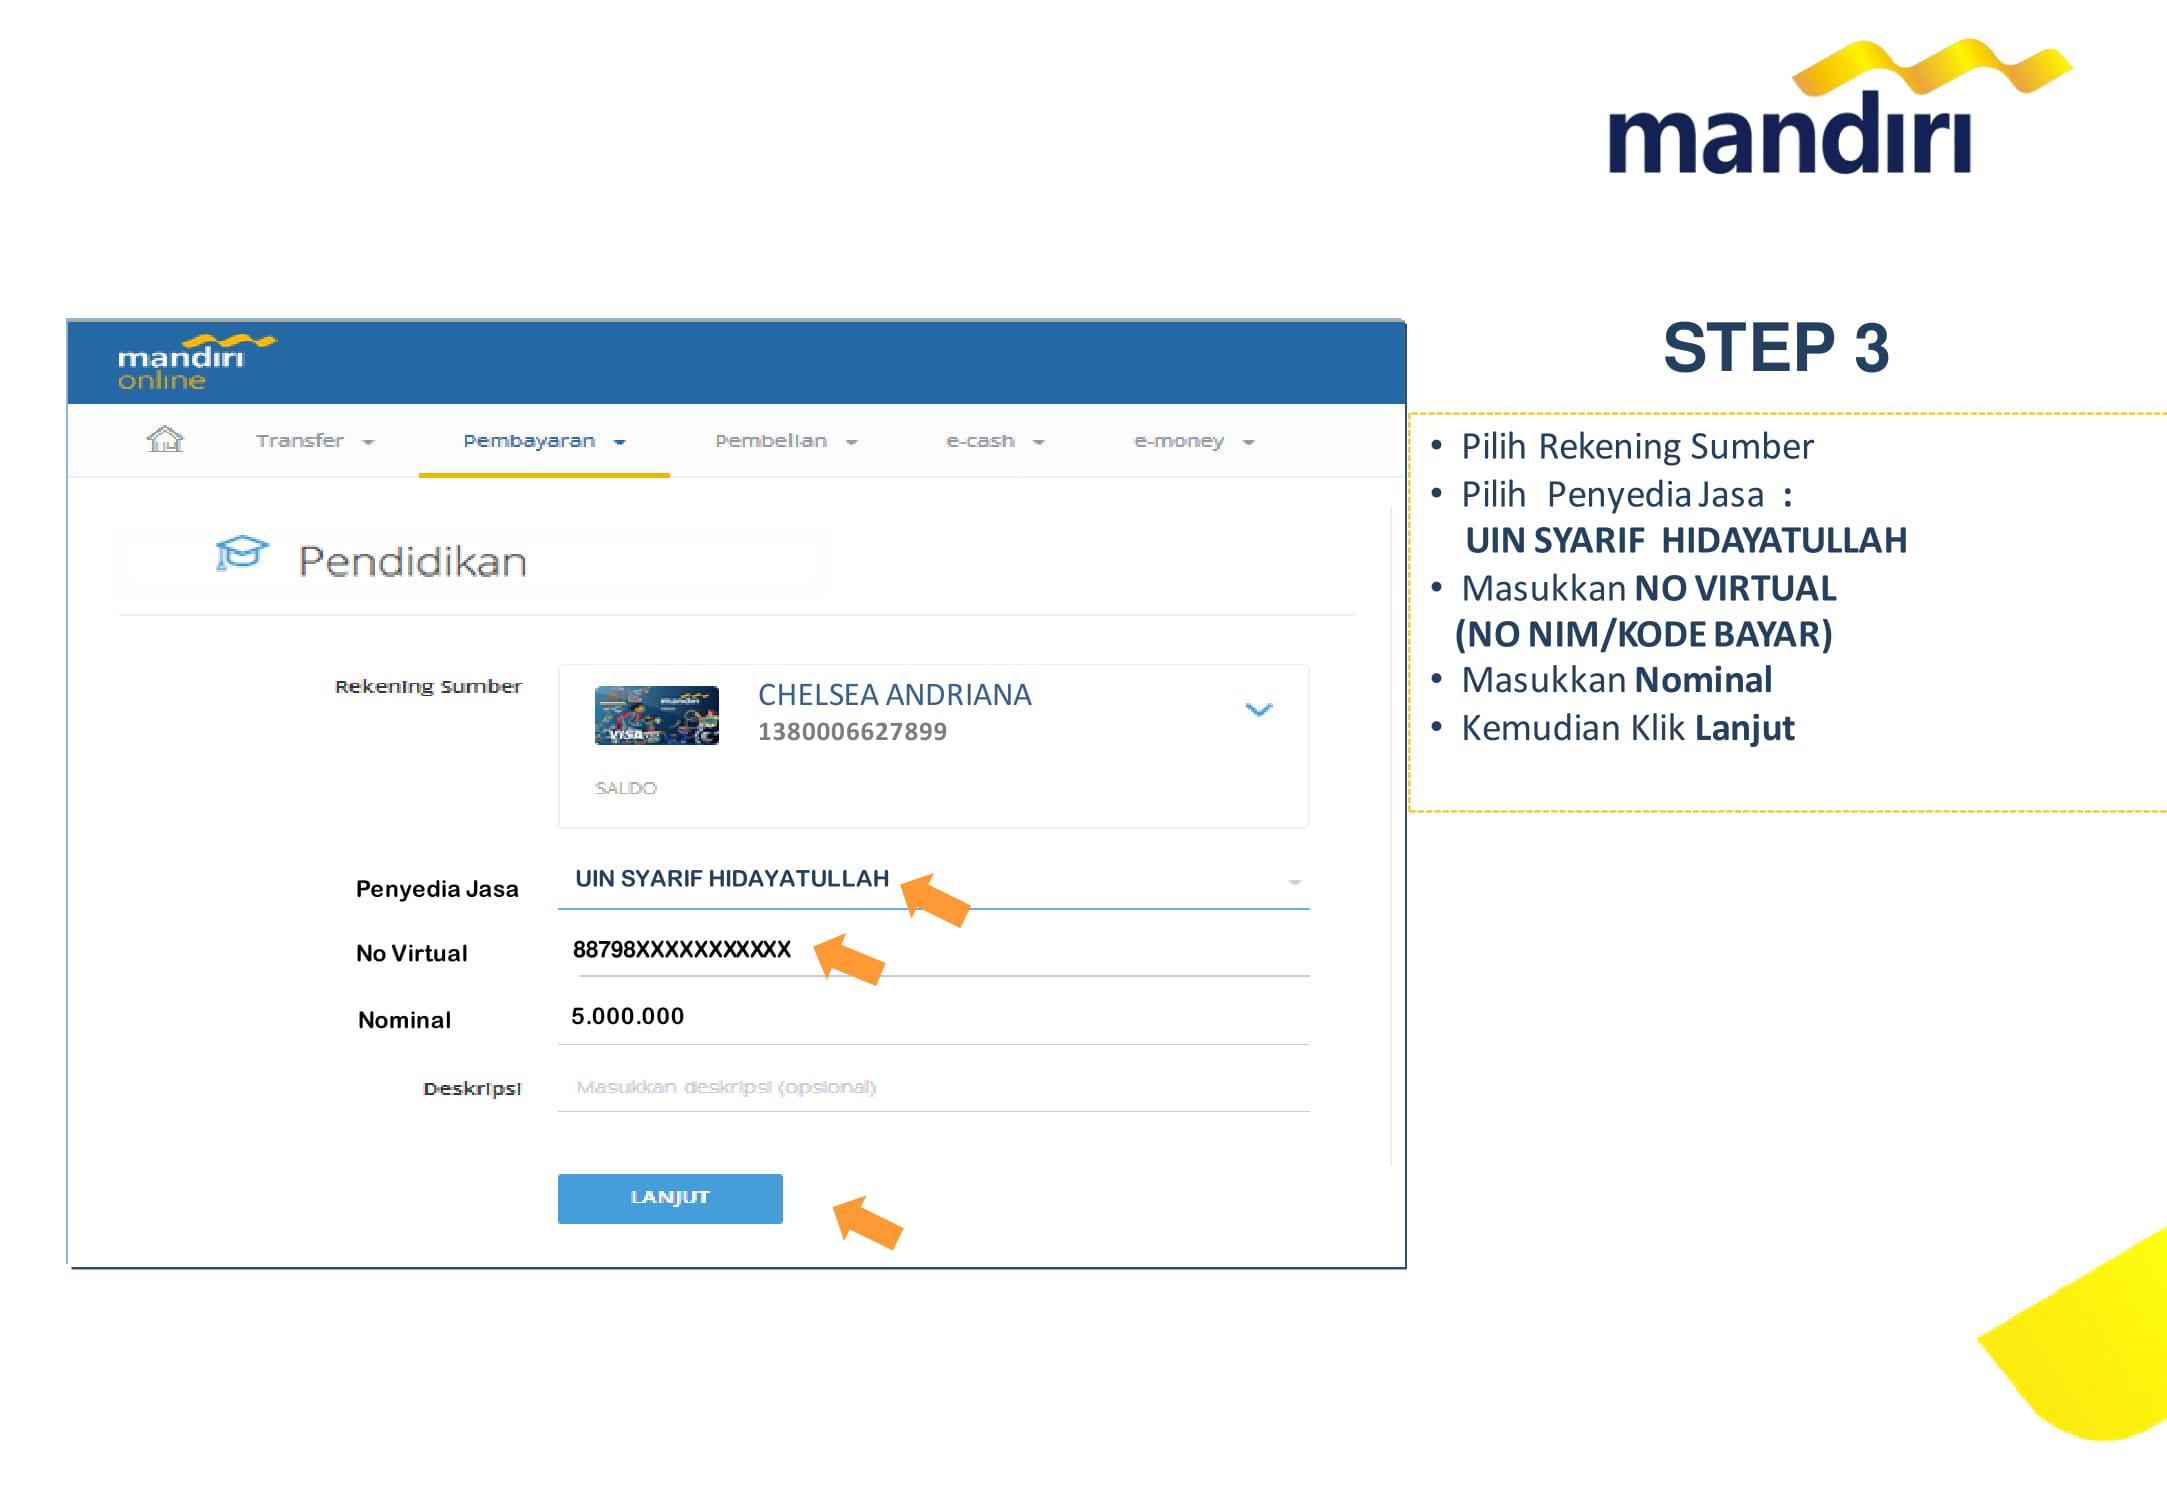 mandiri_ibank_step3